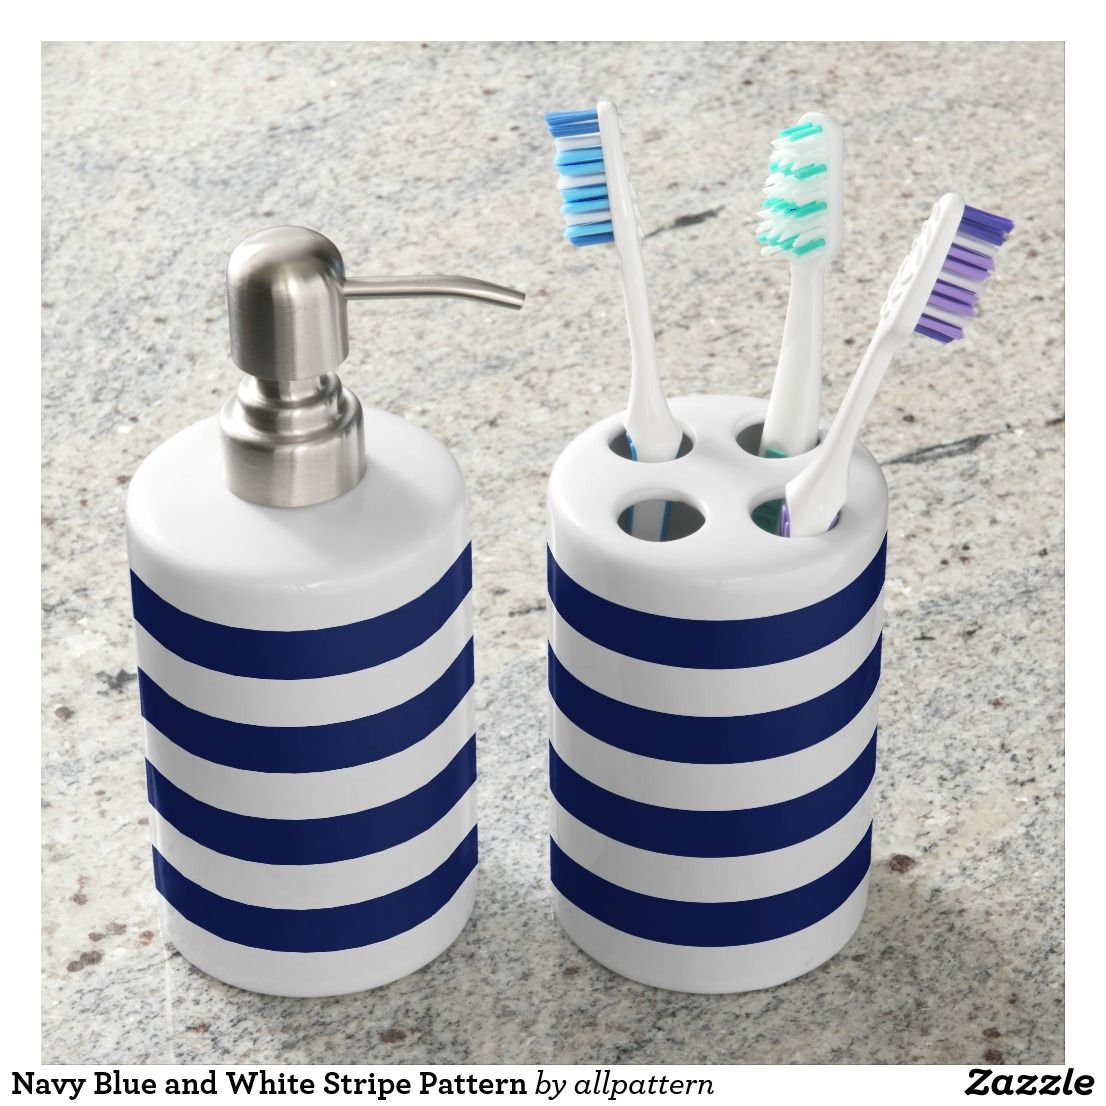 Navy Blue and White Stripe Pattern Soap Dispenser & Toothbrush ...